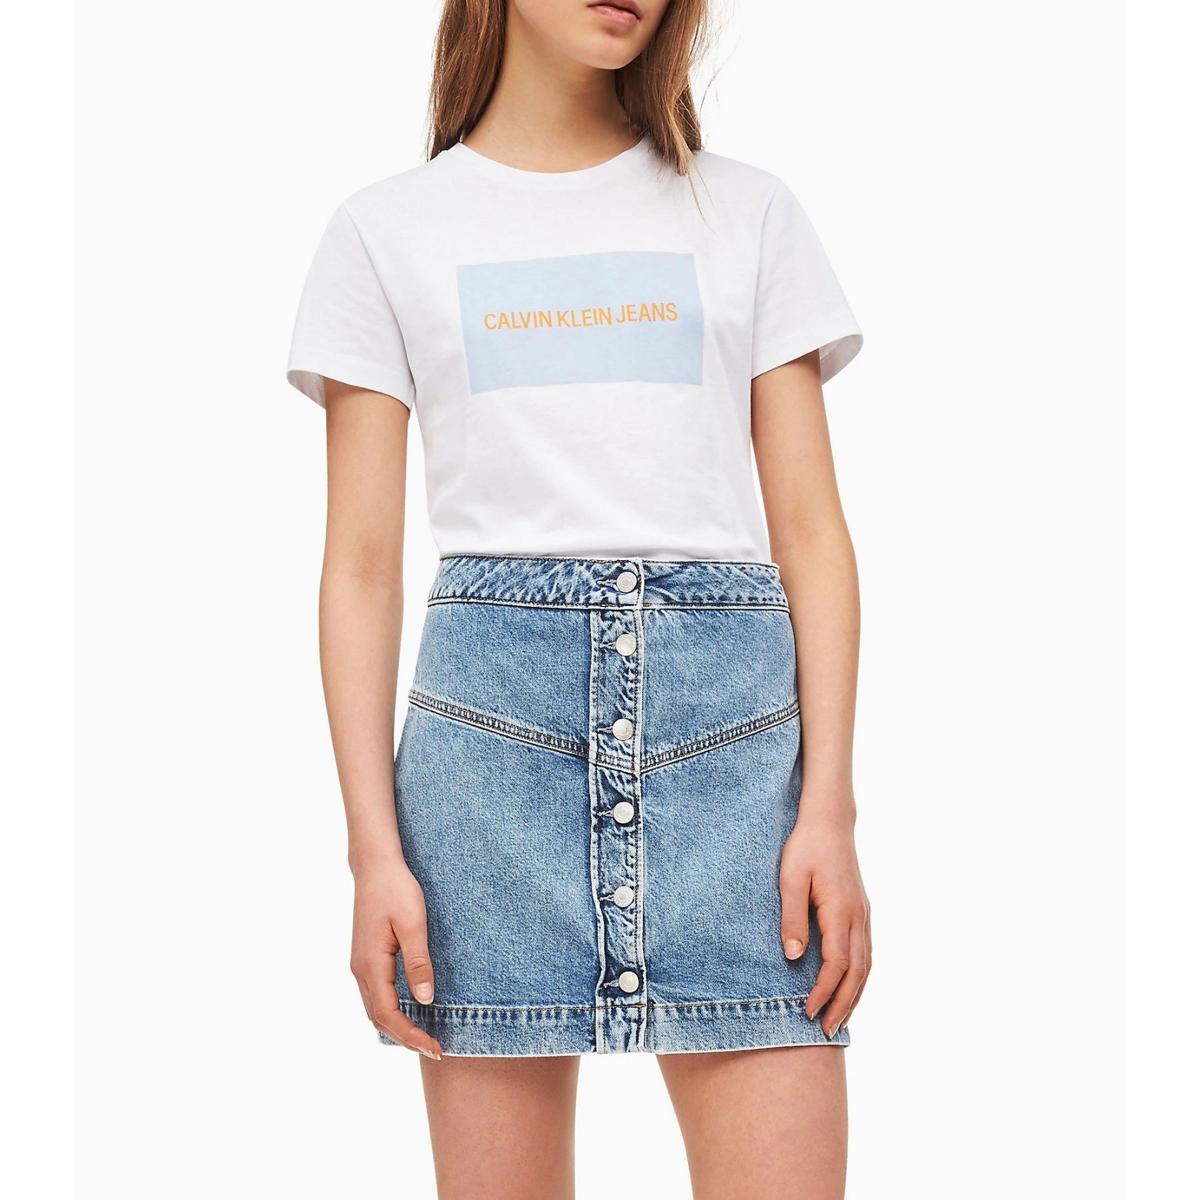 T-shirt Calvin Klein Jeans slim con logo da donna rif. J20J211503